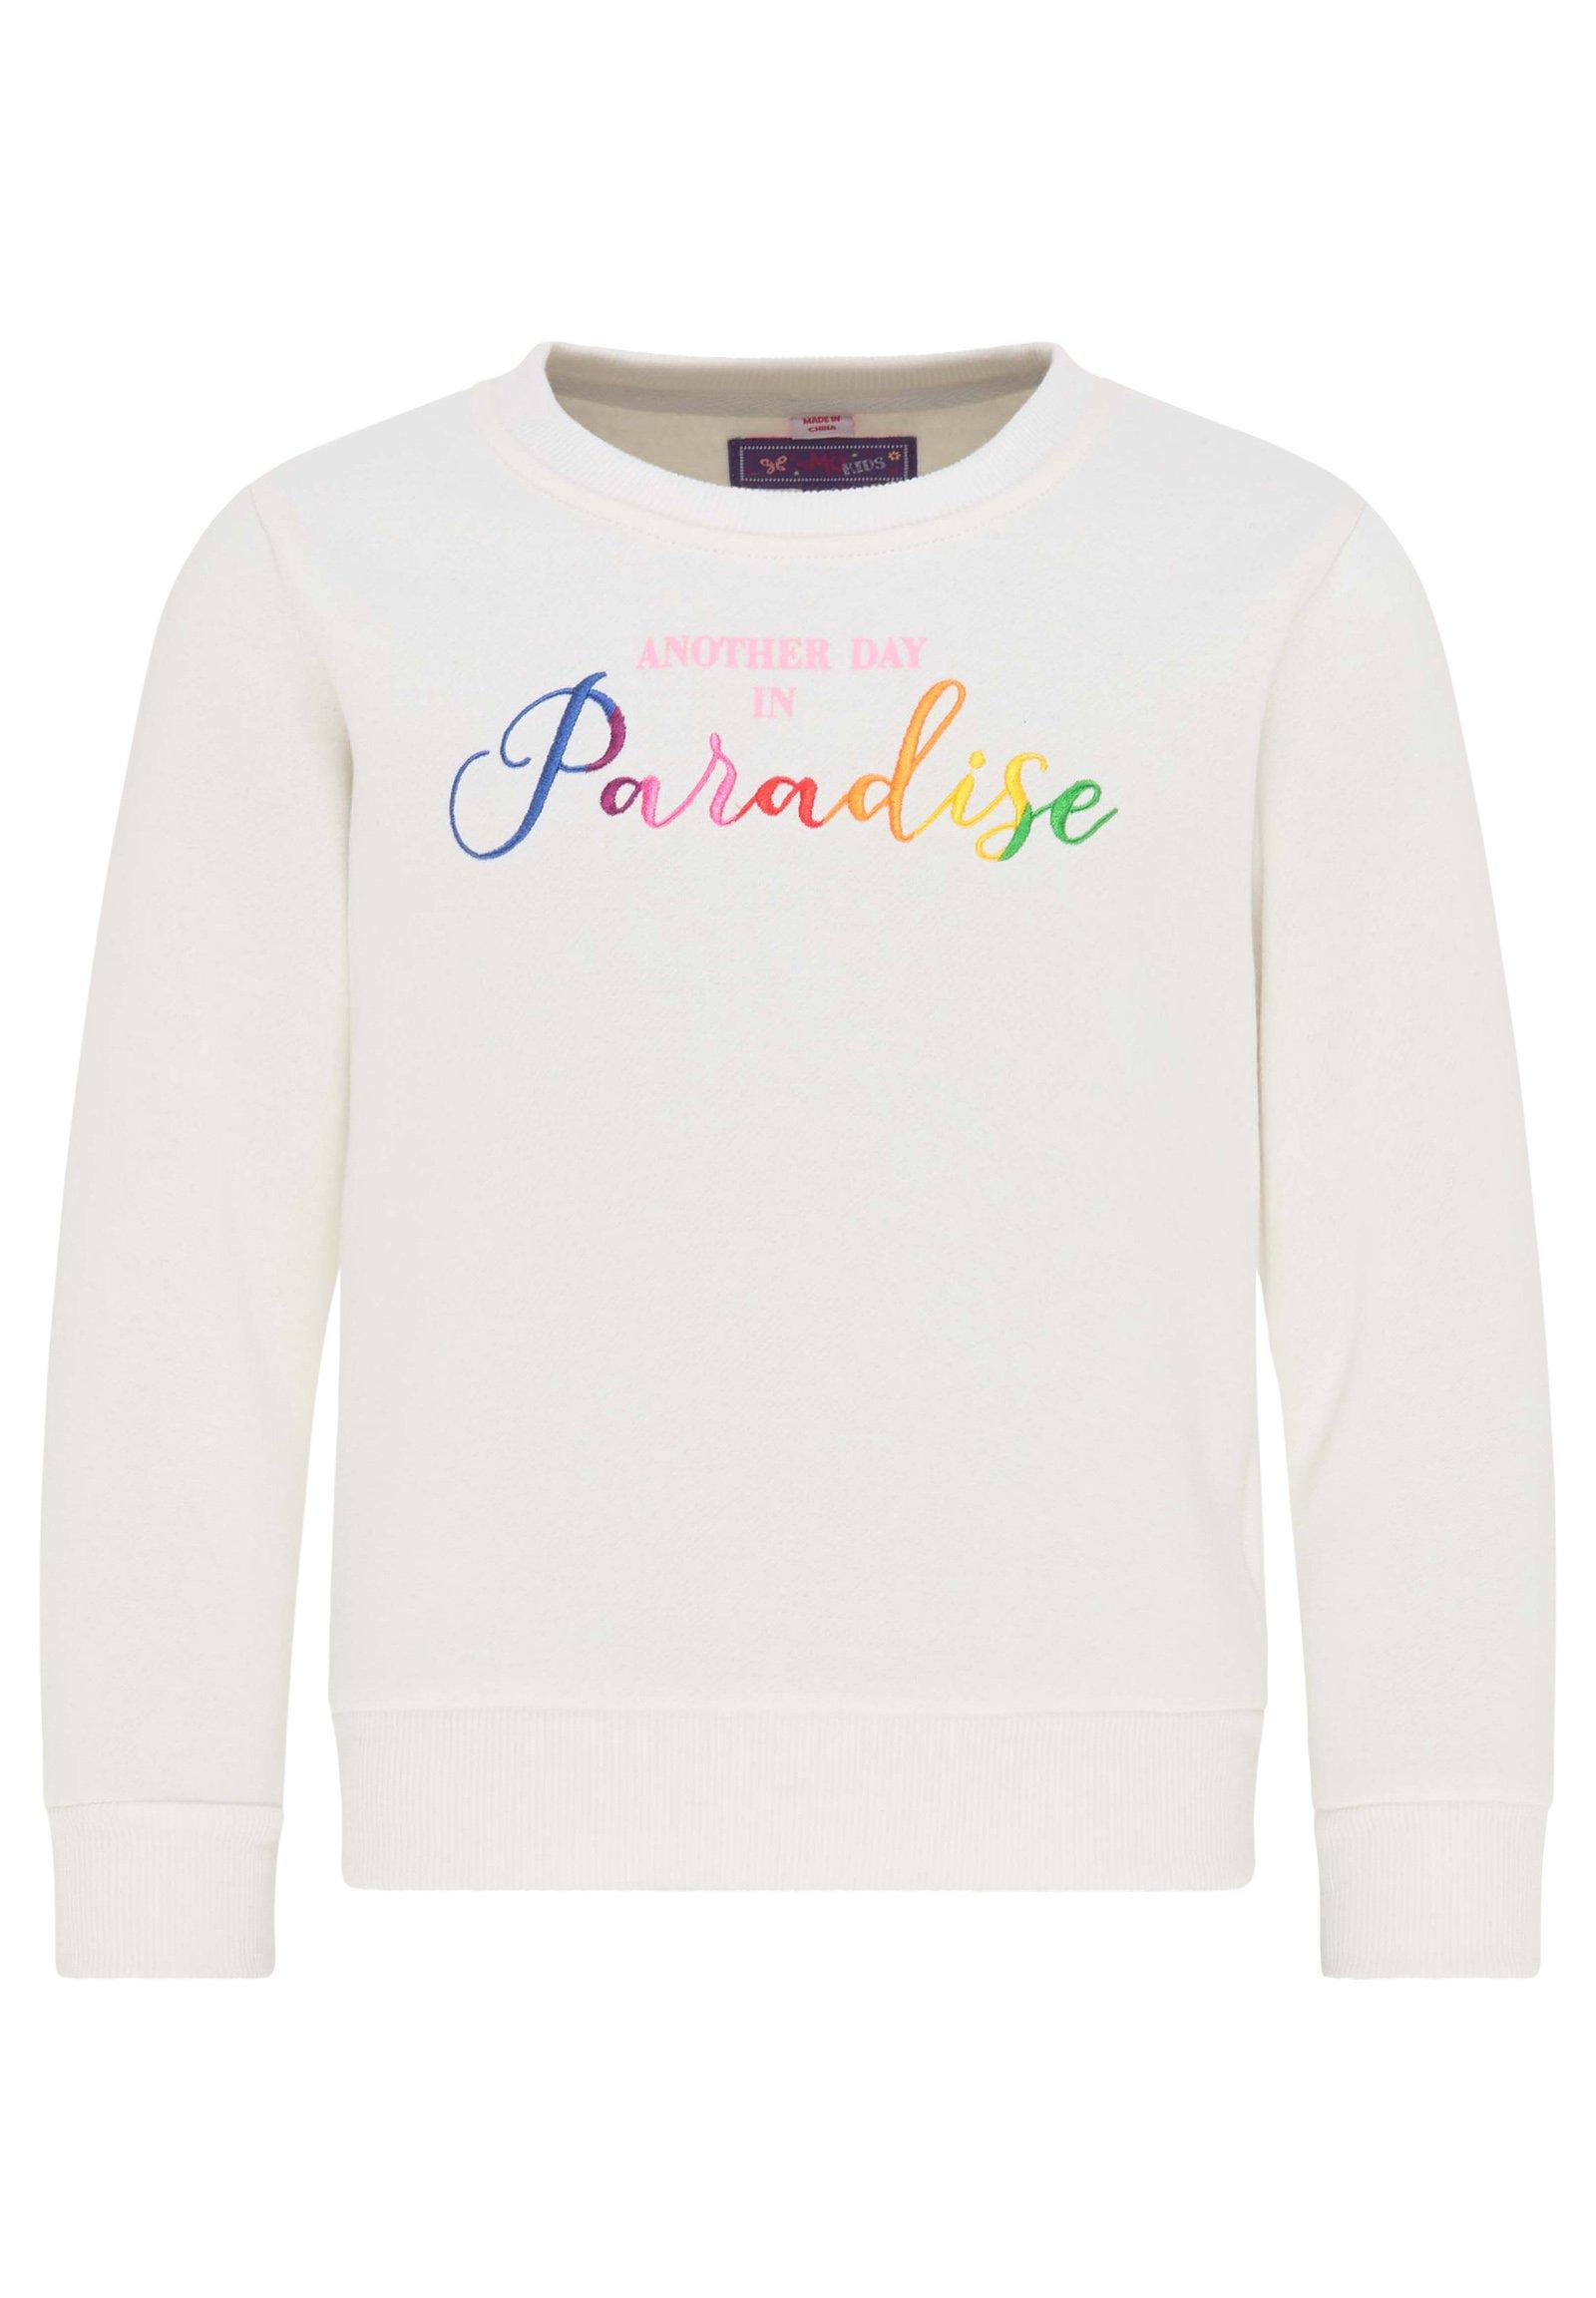 Enfant Sweatshirt